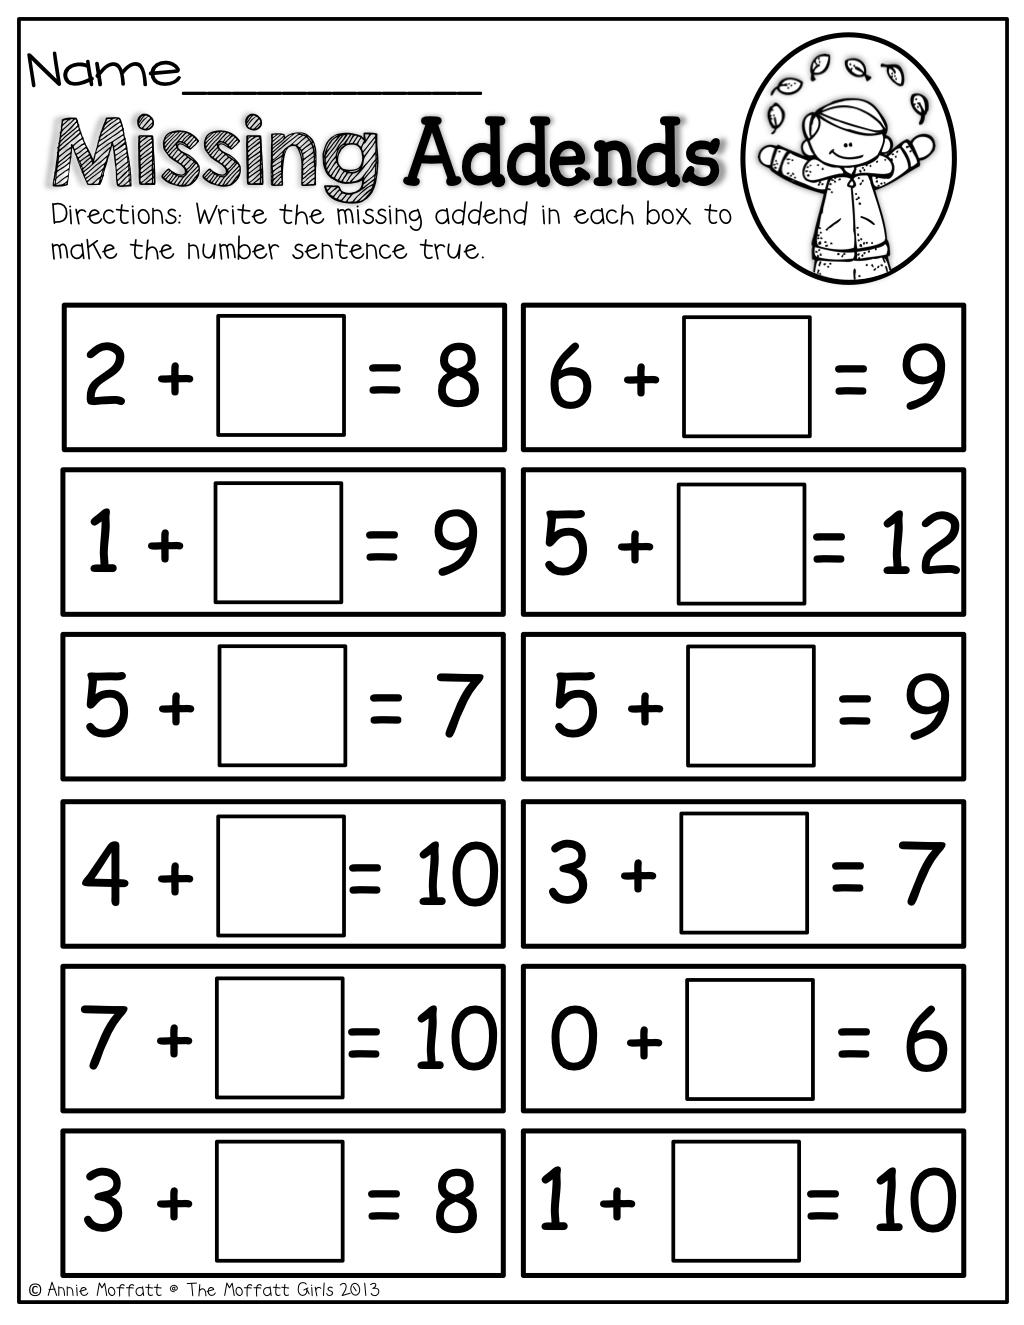 worksheet Missing Addend missing addends math pinterest literacy high schools and addends